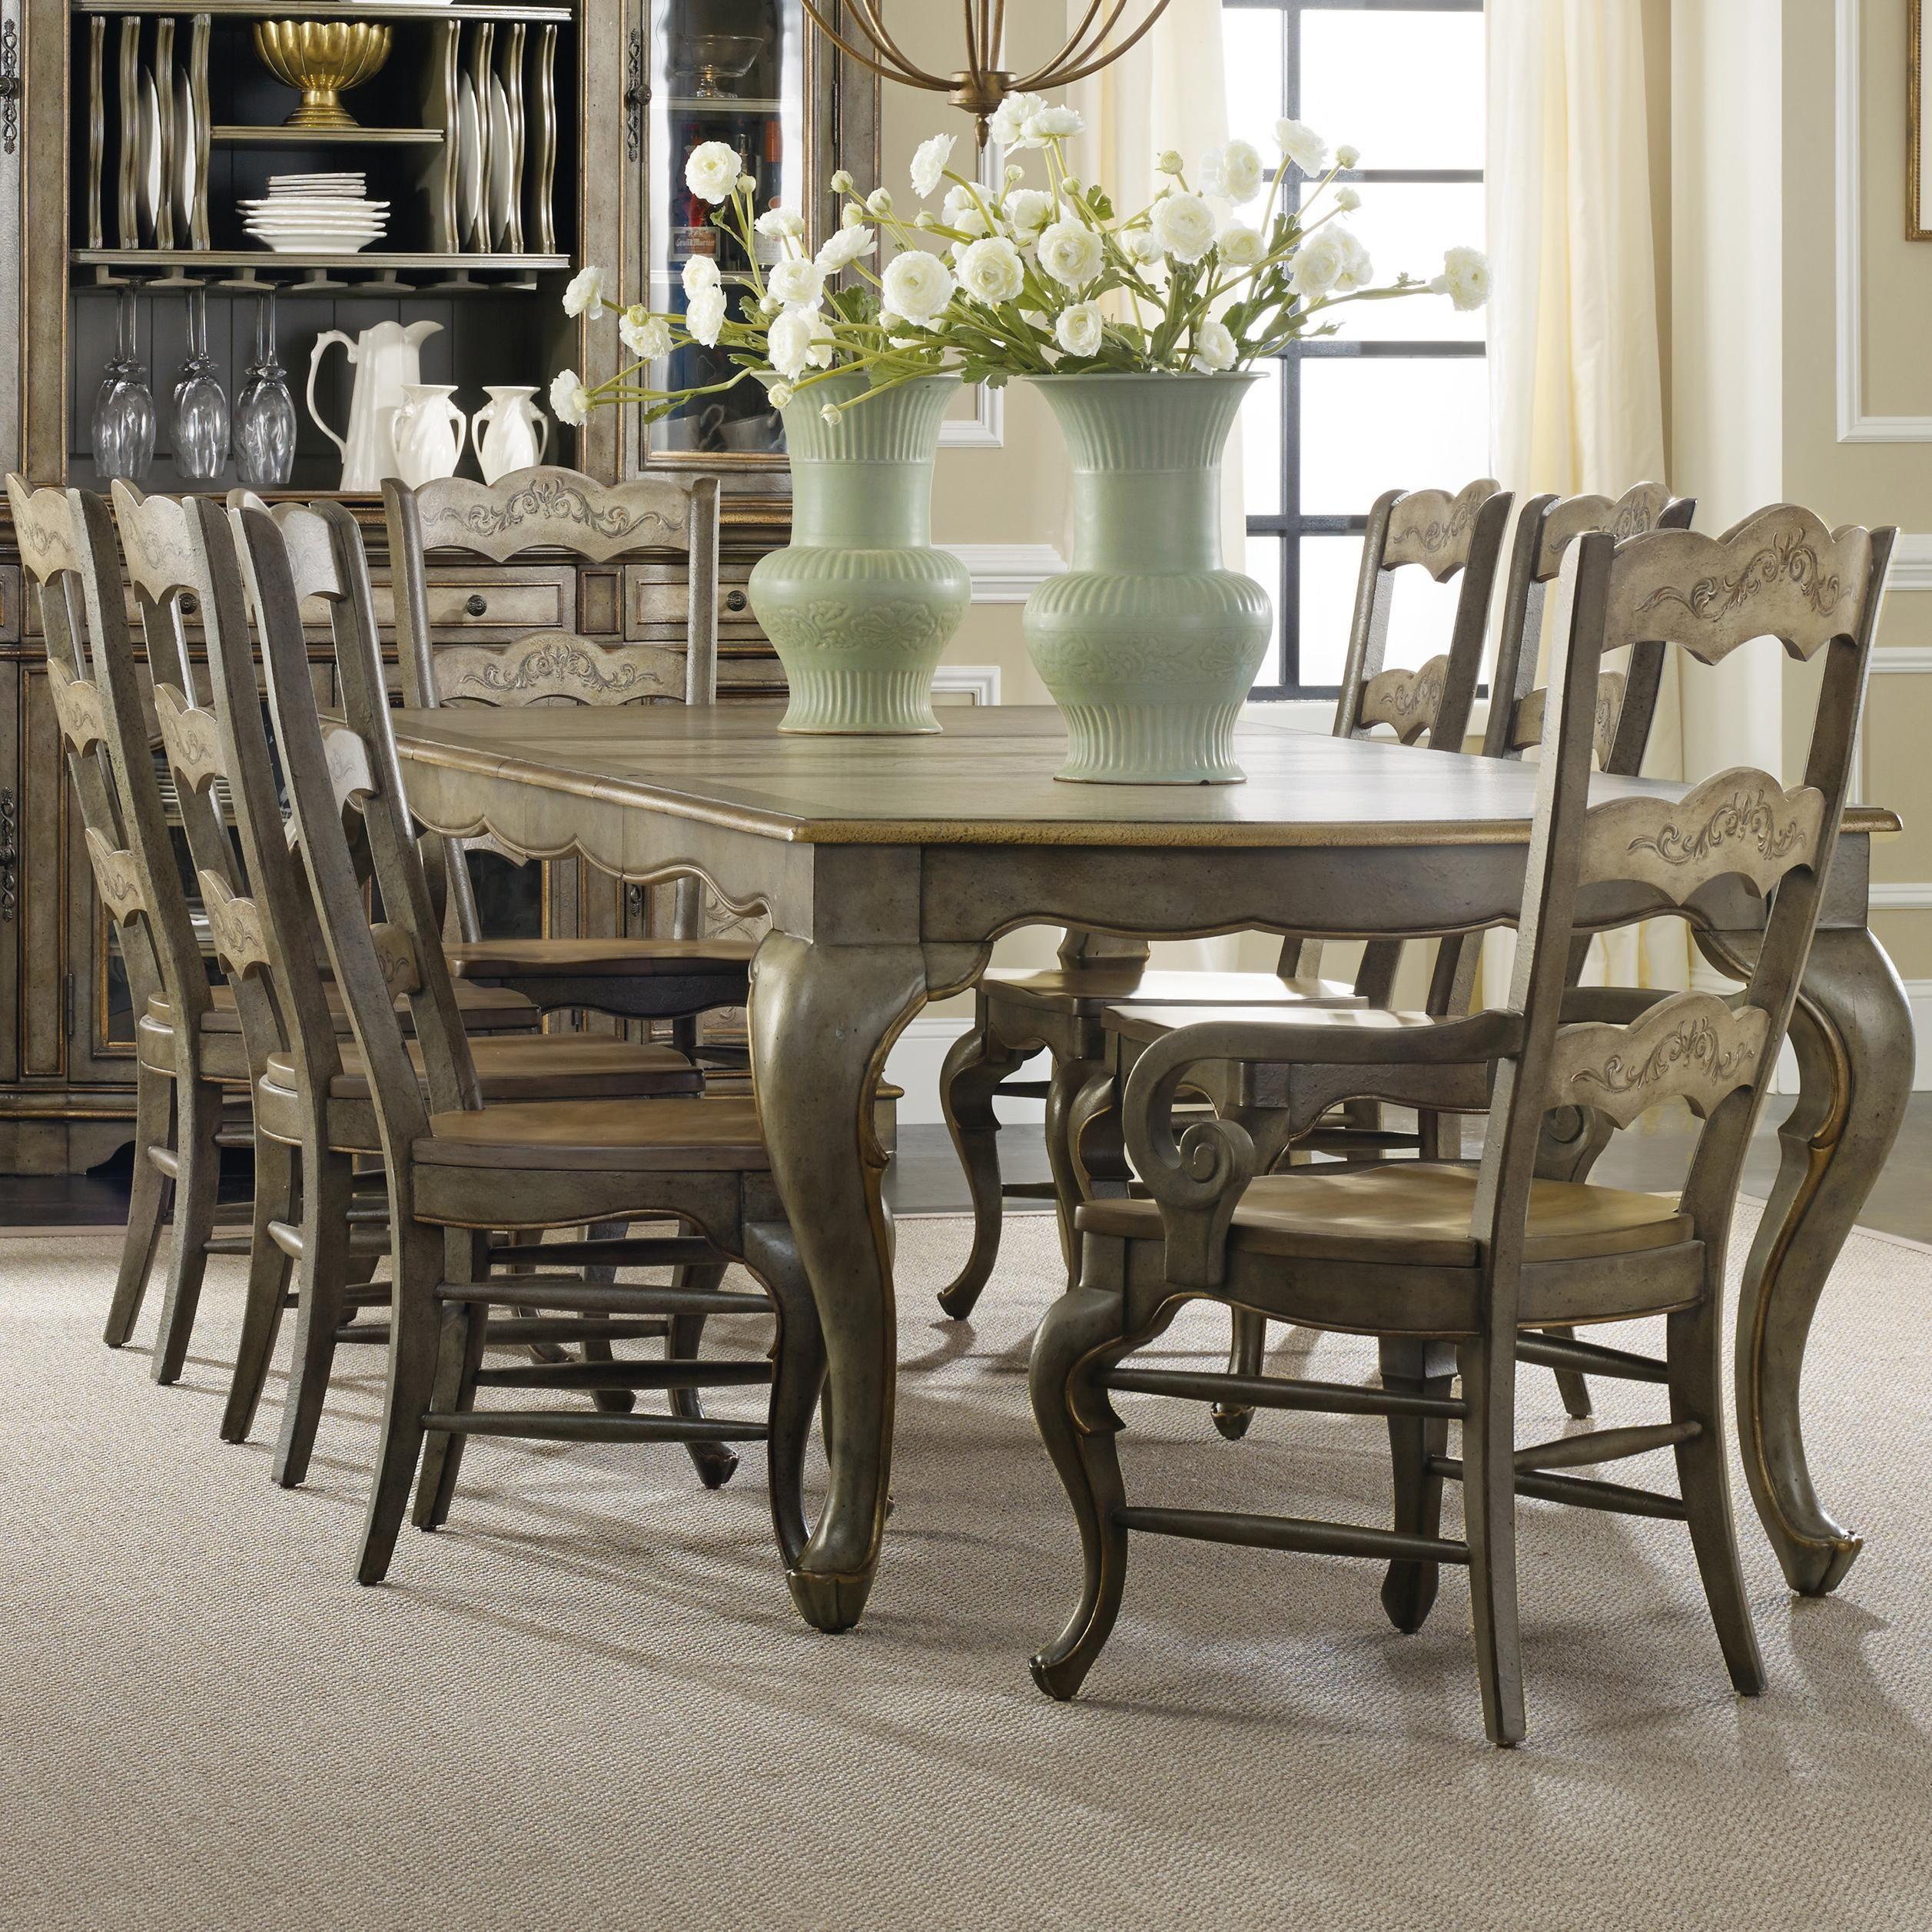 Hooker Furniture La Belle 9 Piece Dining Set With Rectangular Table